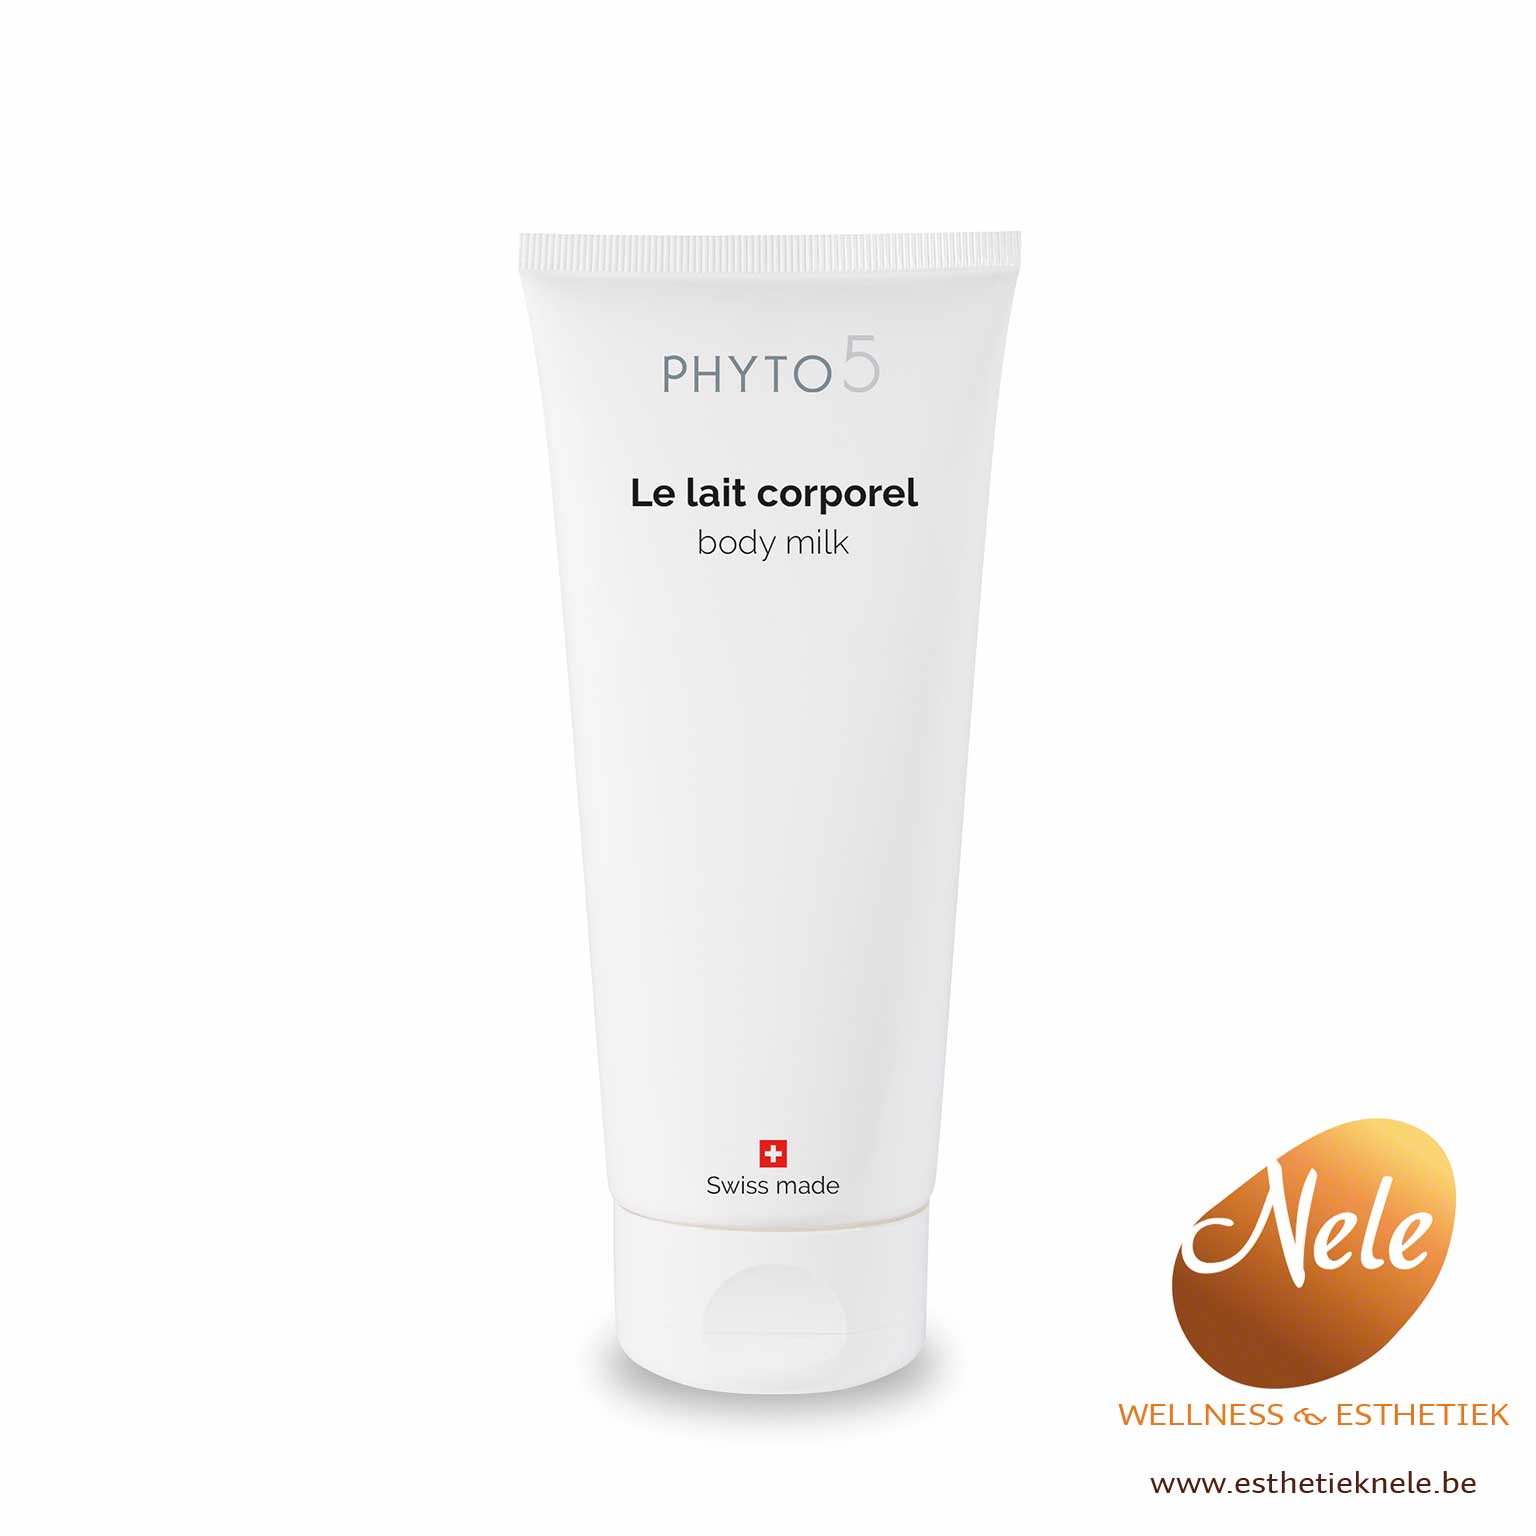 PHYTO 5 Lait Corporel bio bodymilk Wellness Esthetiek Nele